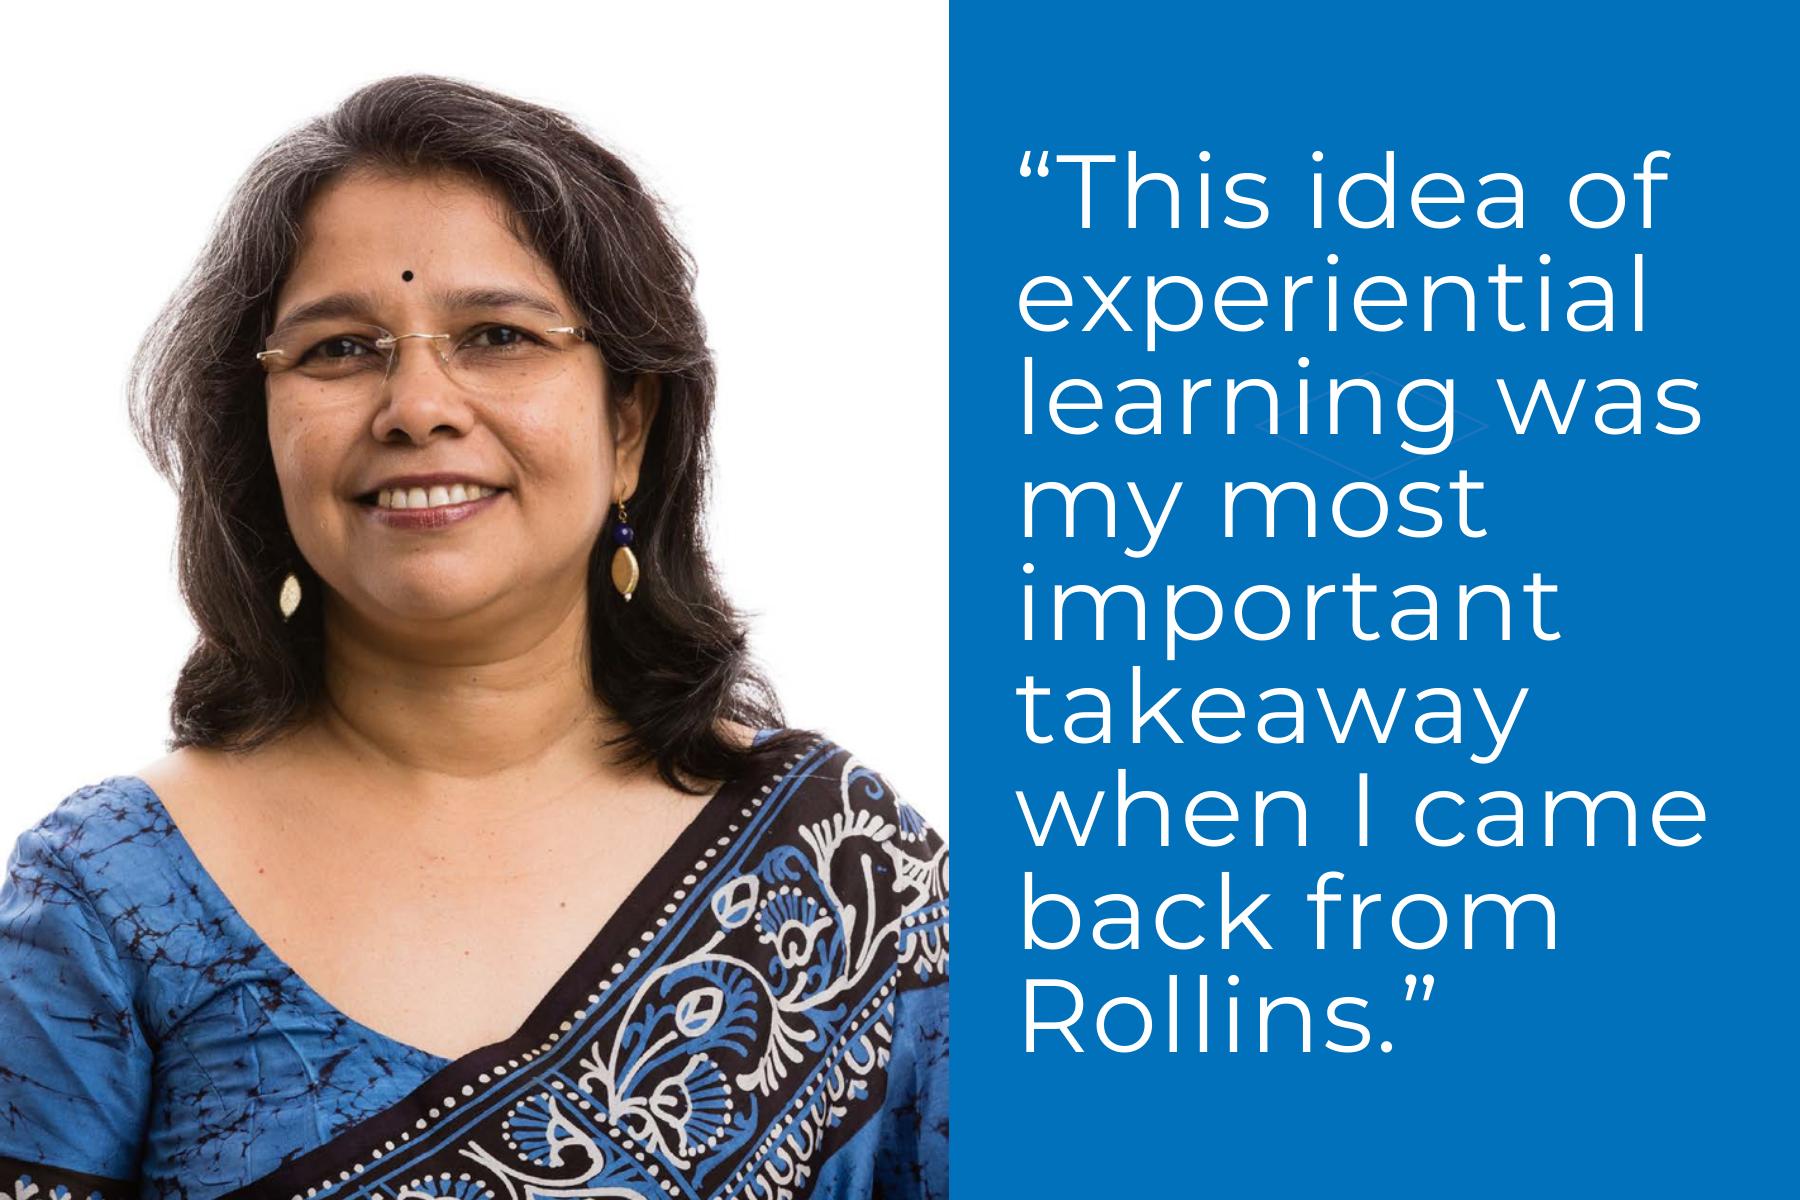 Global Links Scholar Sharmistha Banerjee